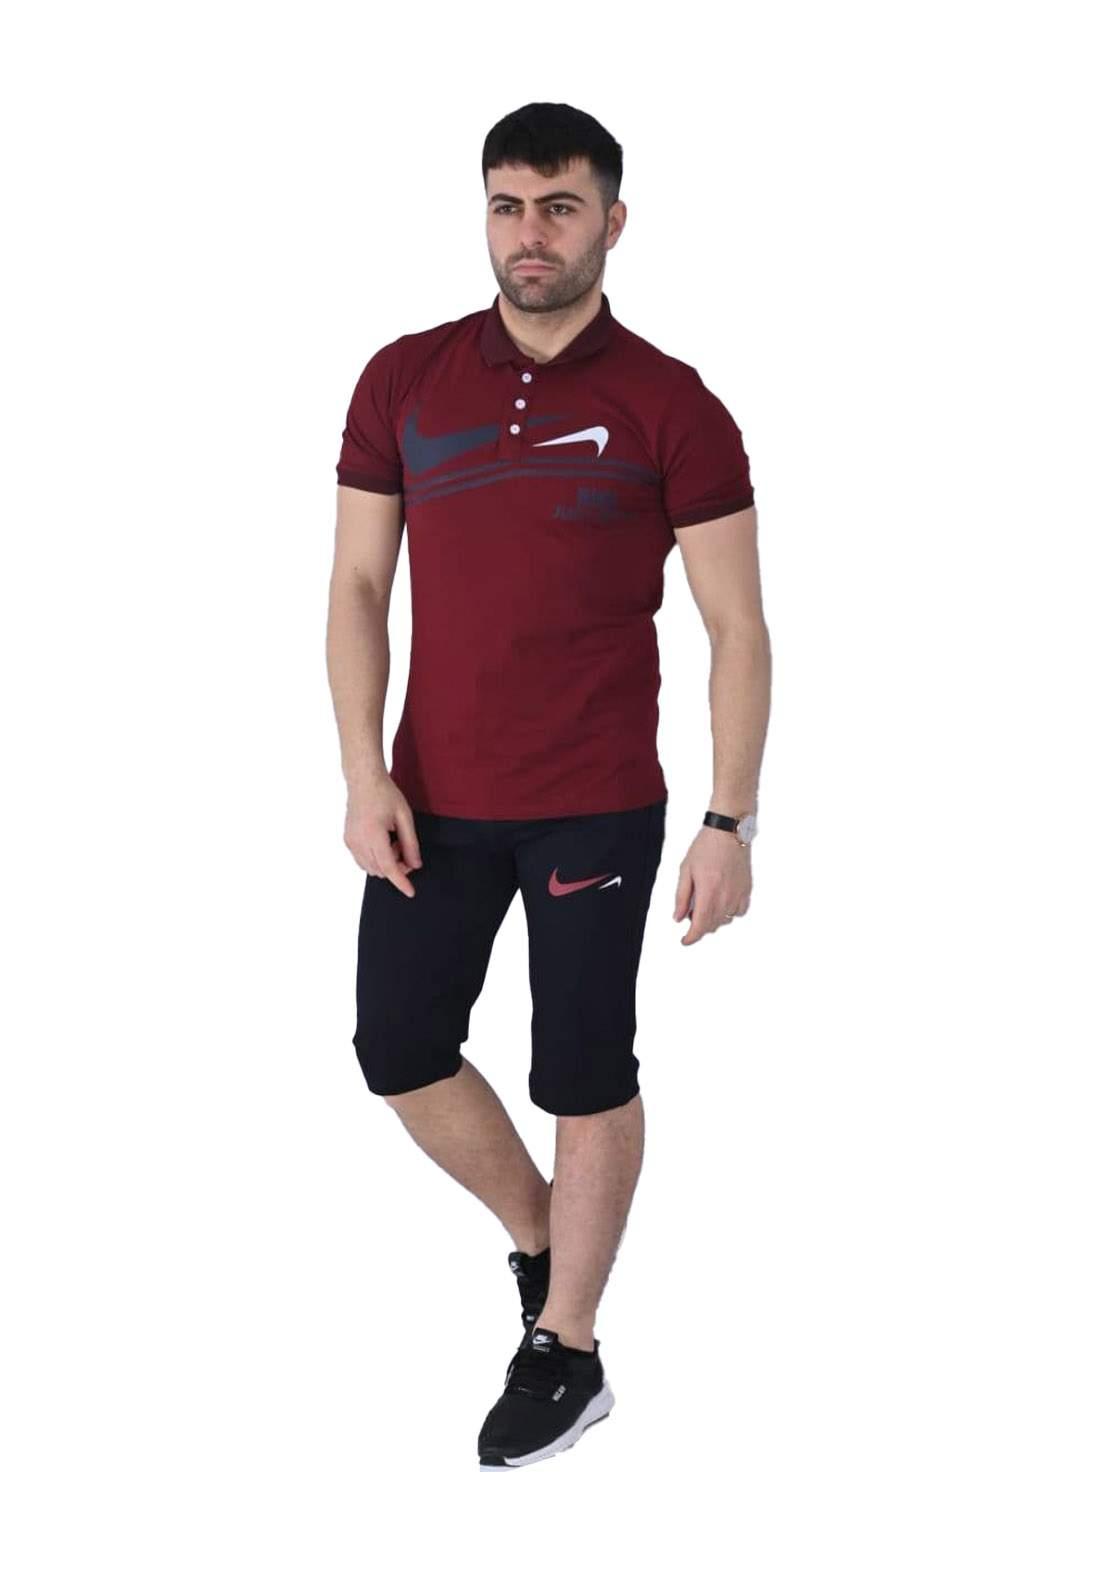 Nike Sportswear تراكسوت رجالي احمر  اللون